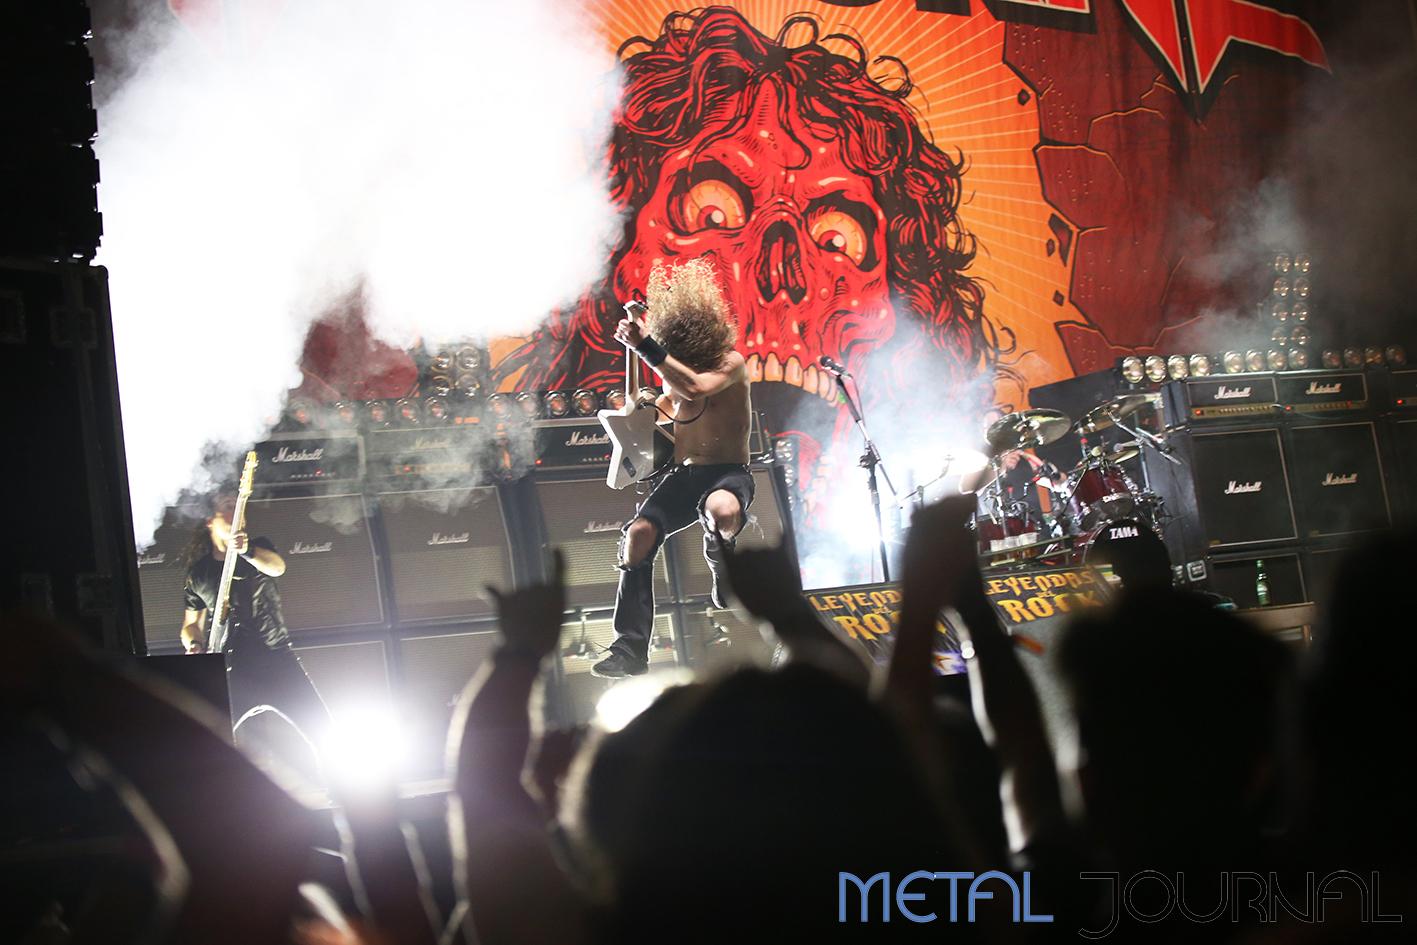 airbourne - leyendas del rock 2019 metal journal pic 4